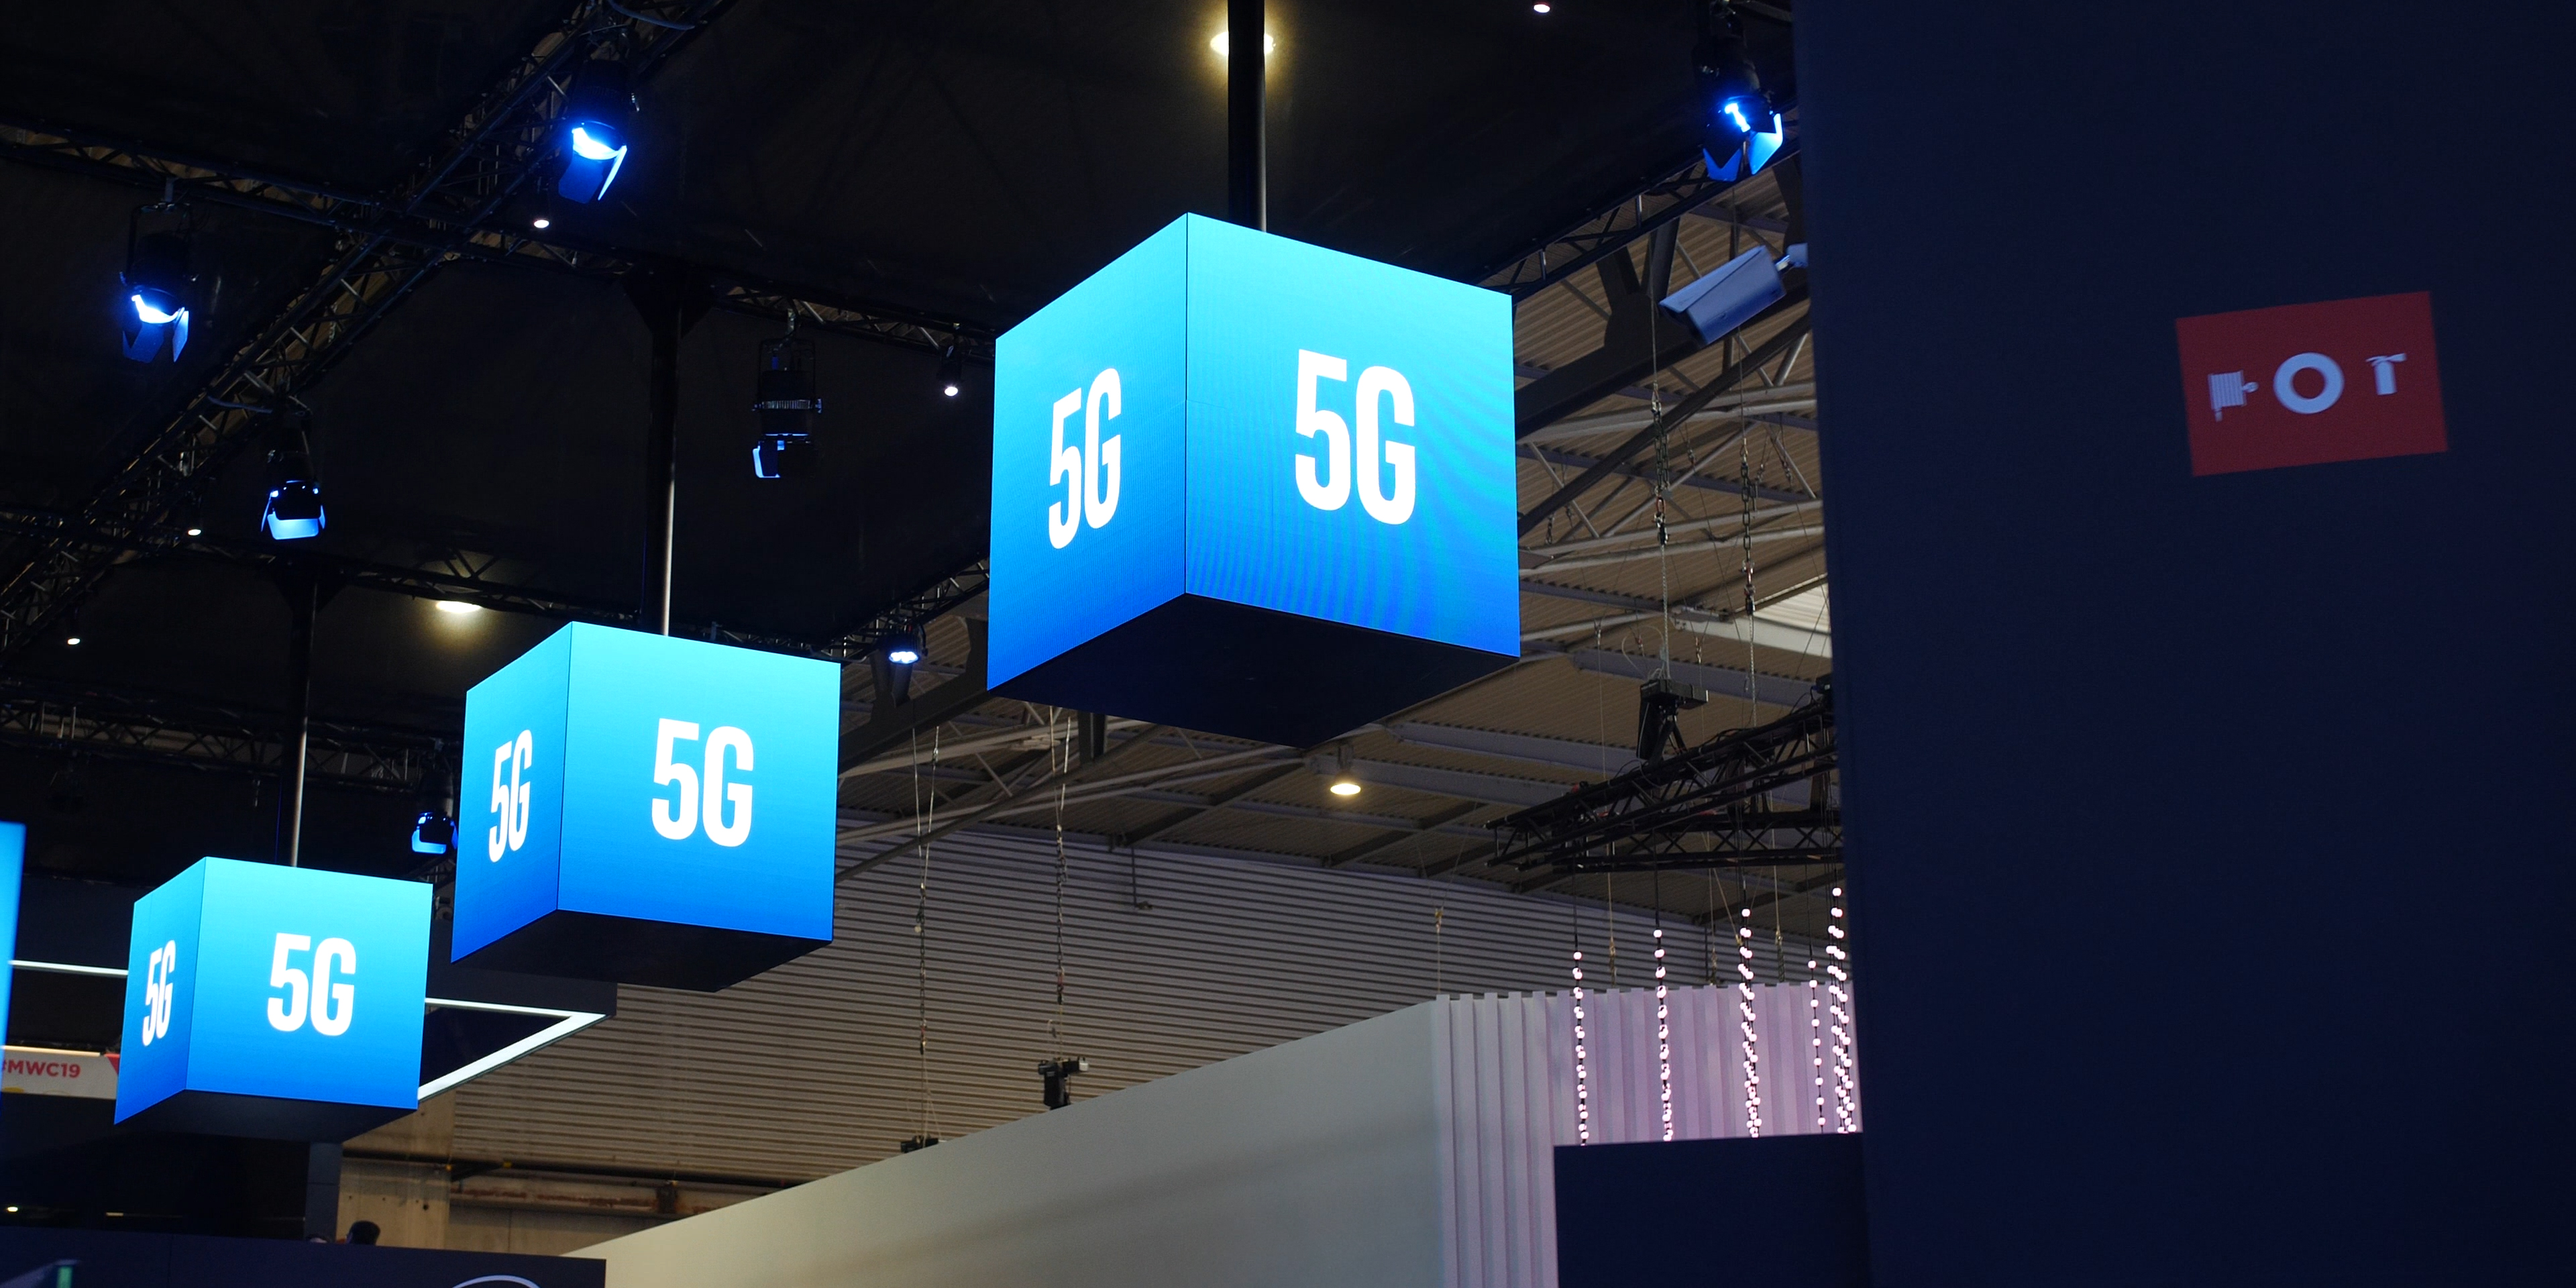 Intel 5G at MWC 2019